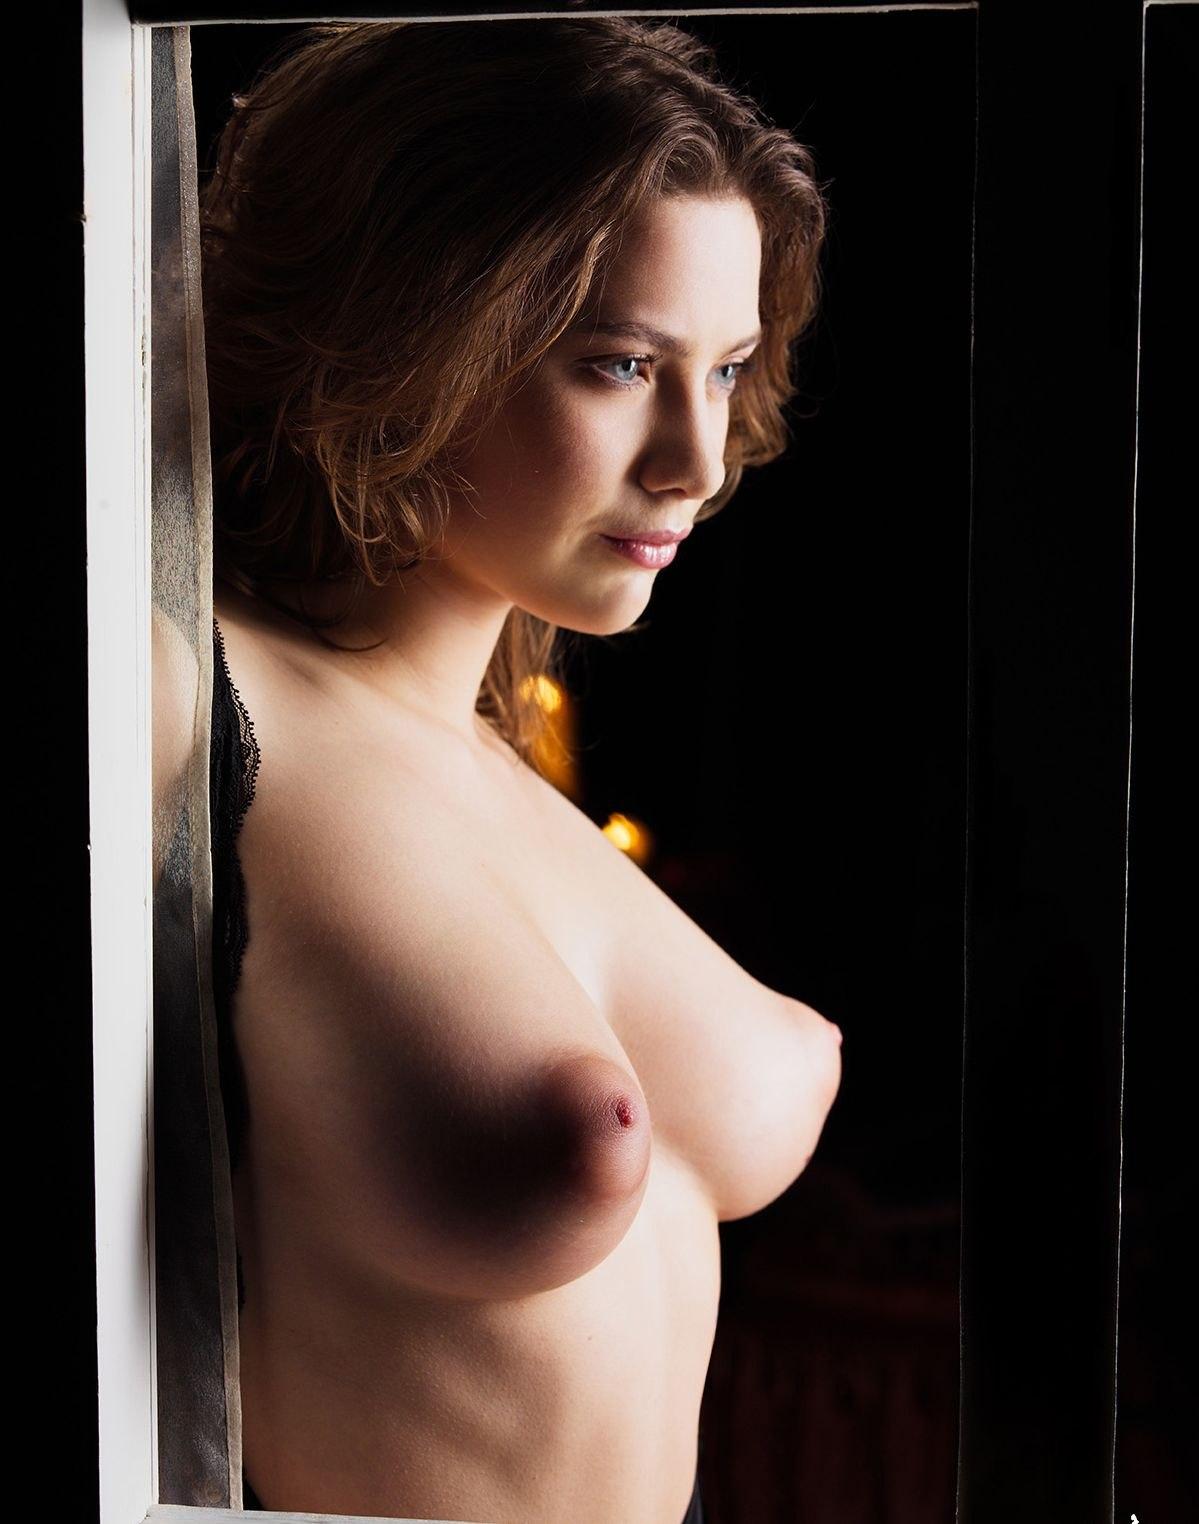 Ester puffy nipples